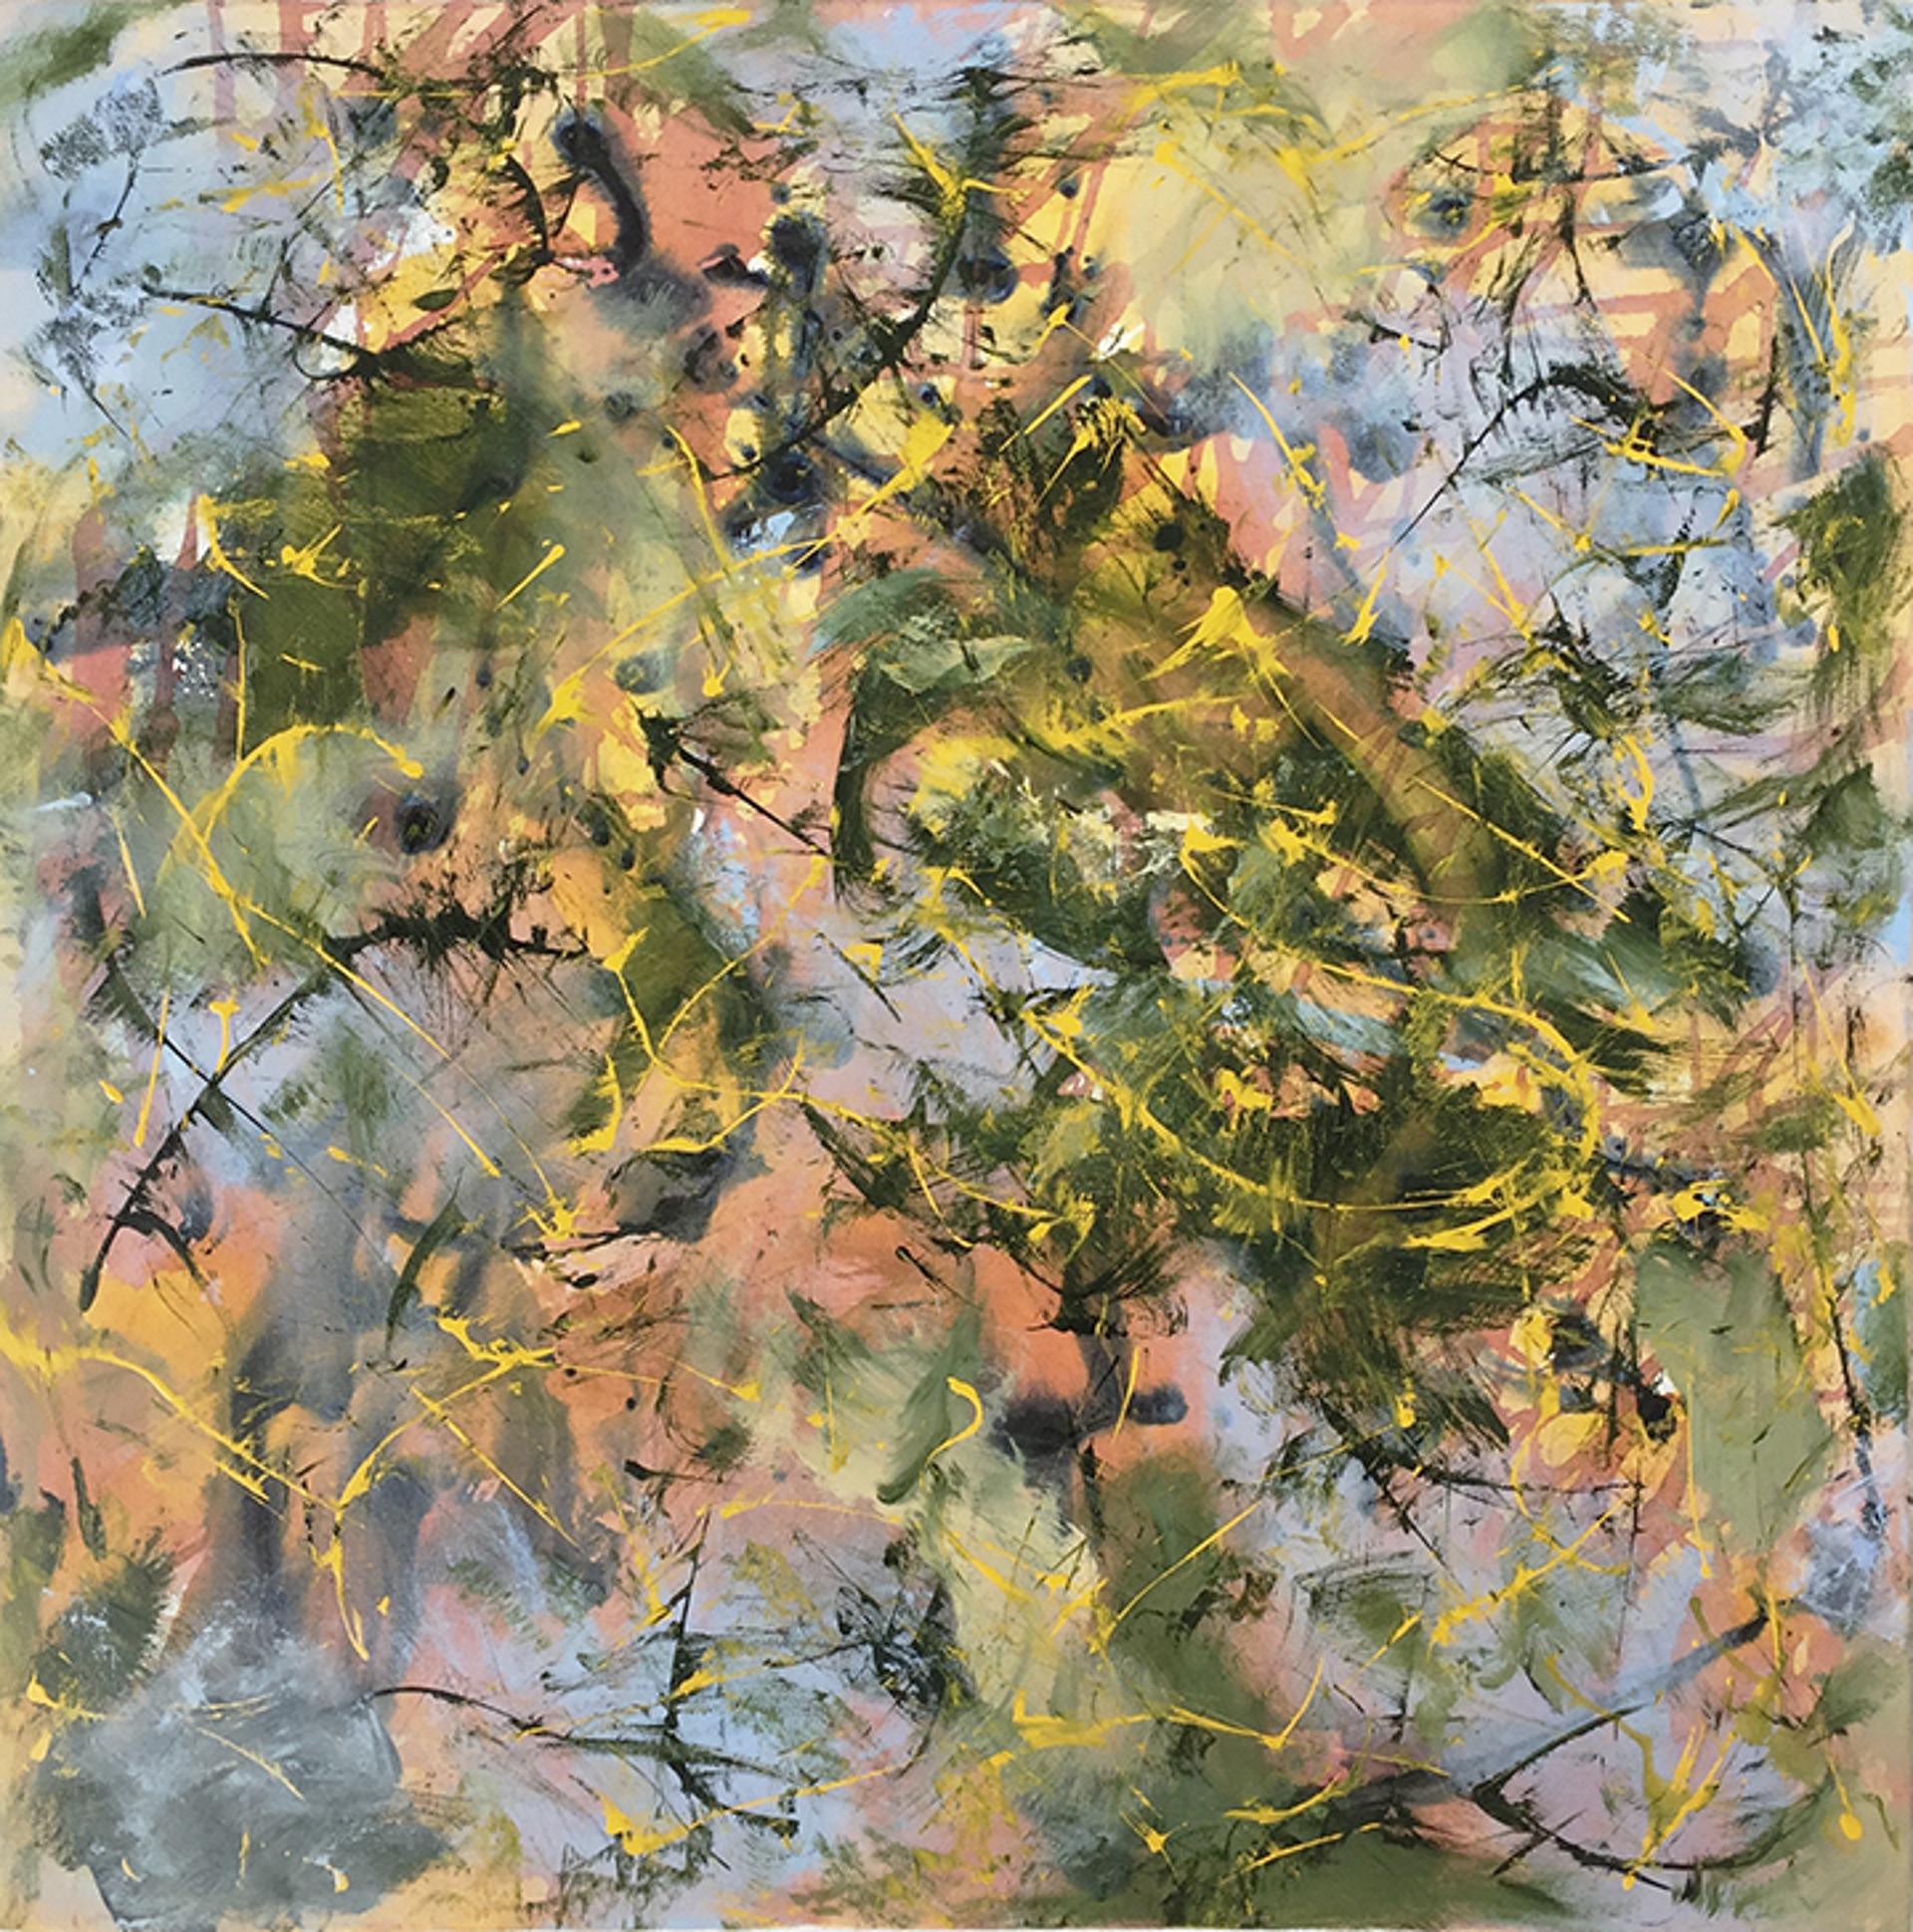 Hematite by David Skillicorn